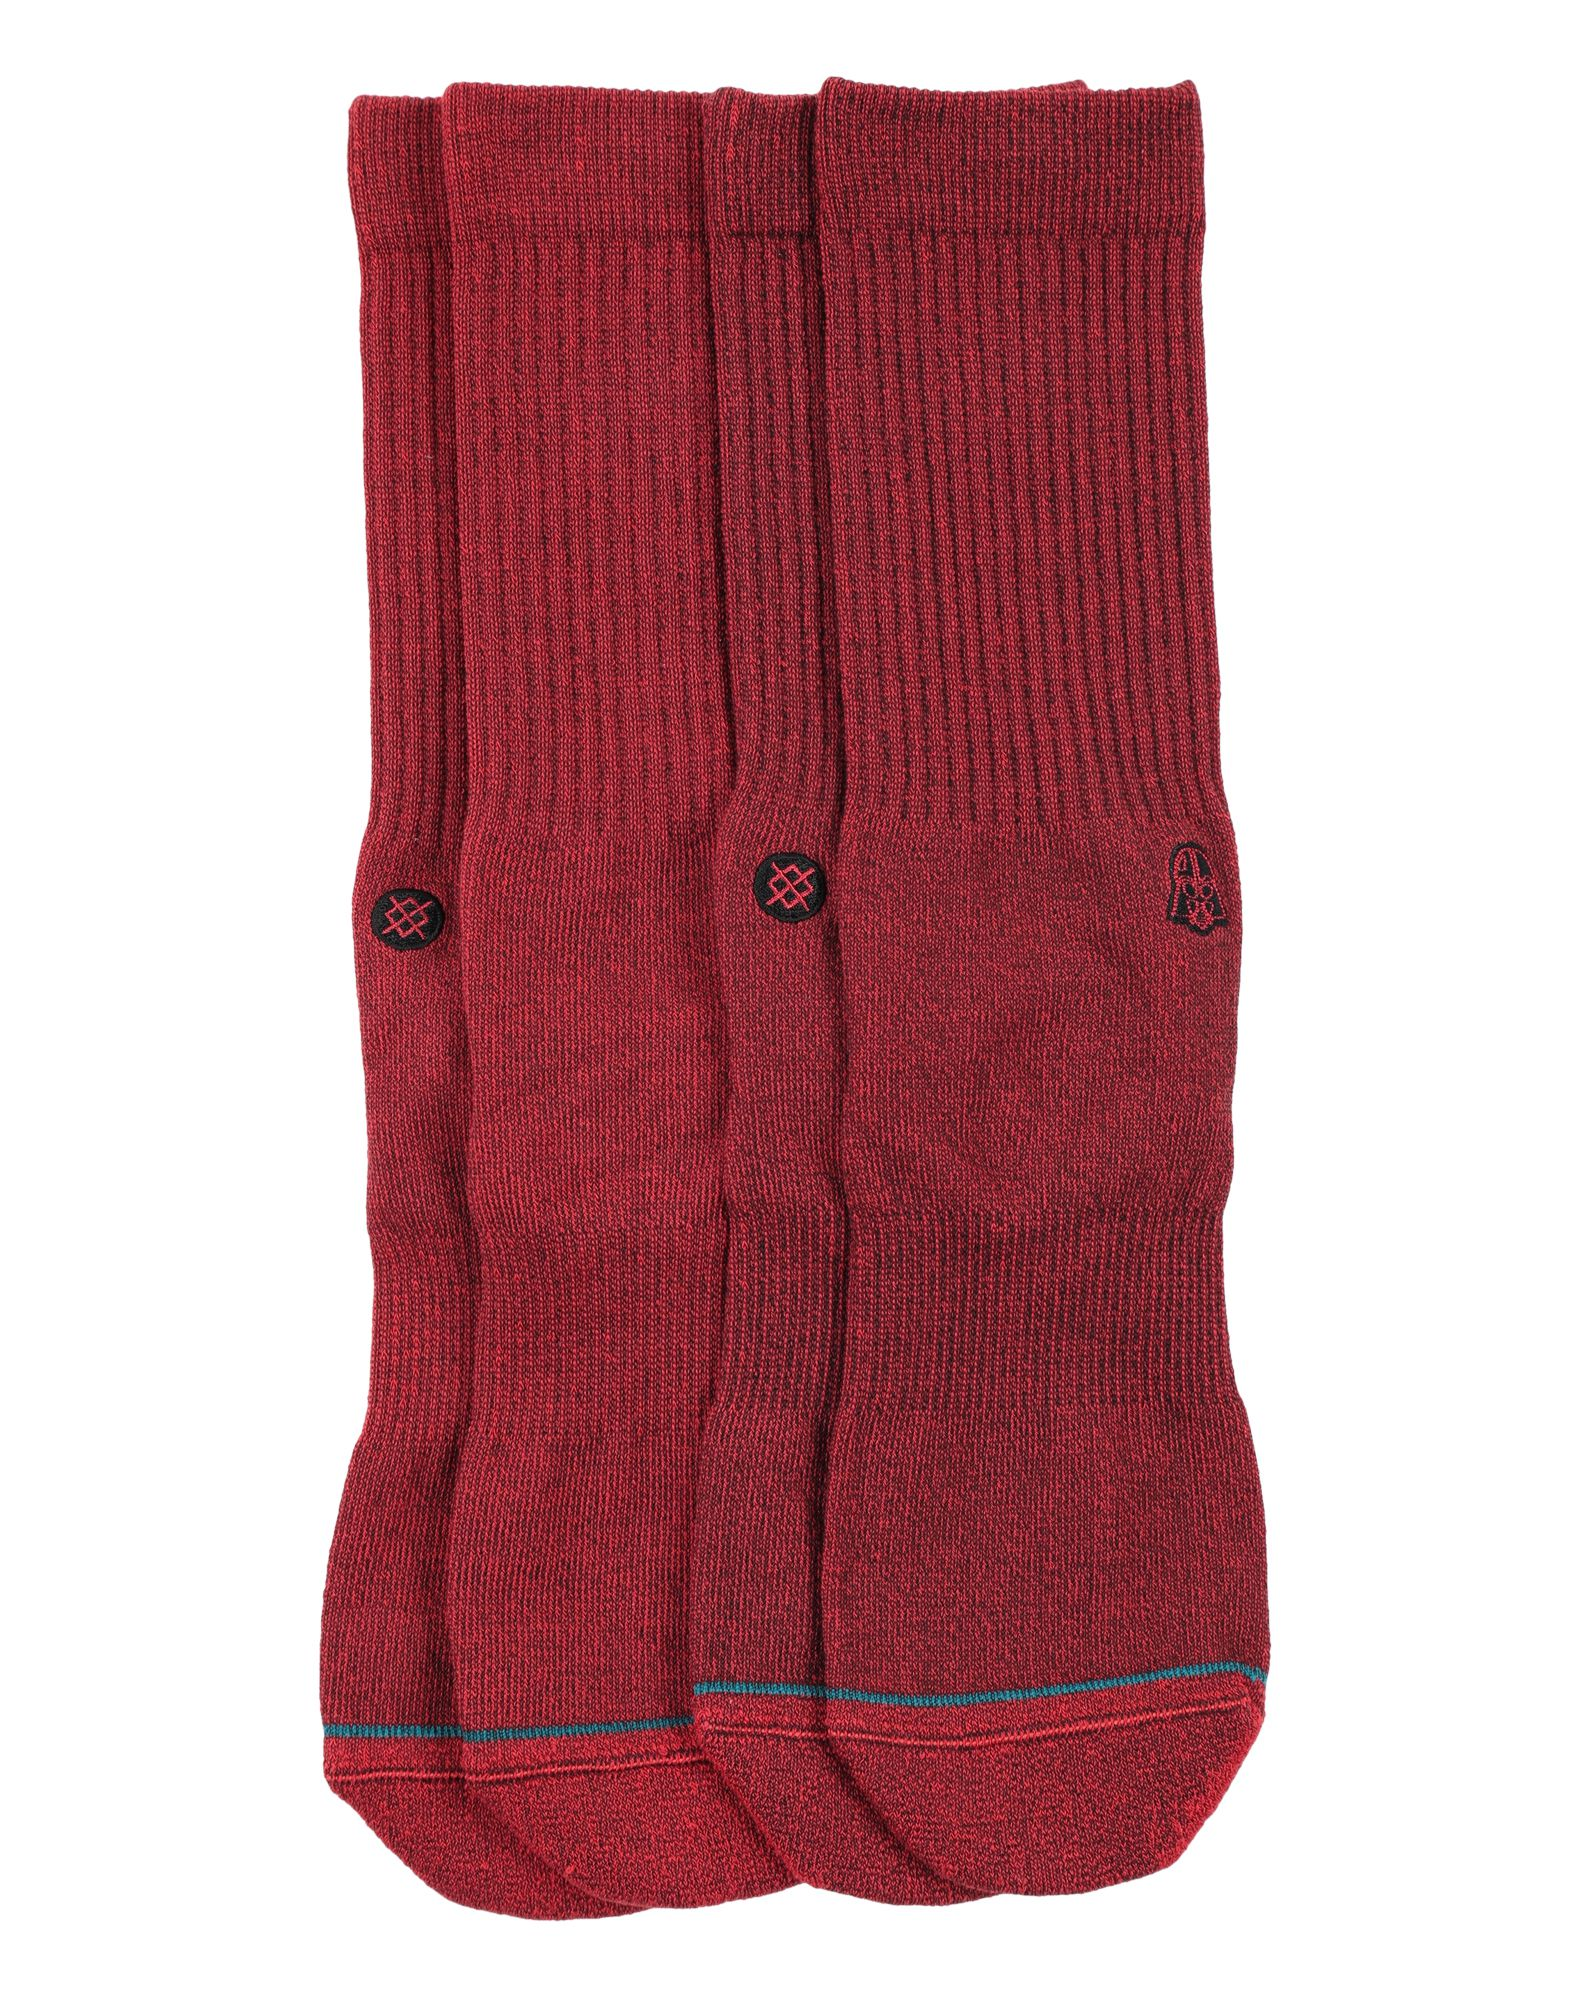 STANCE Короткие носки носки низкие женские stance labrynth pink